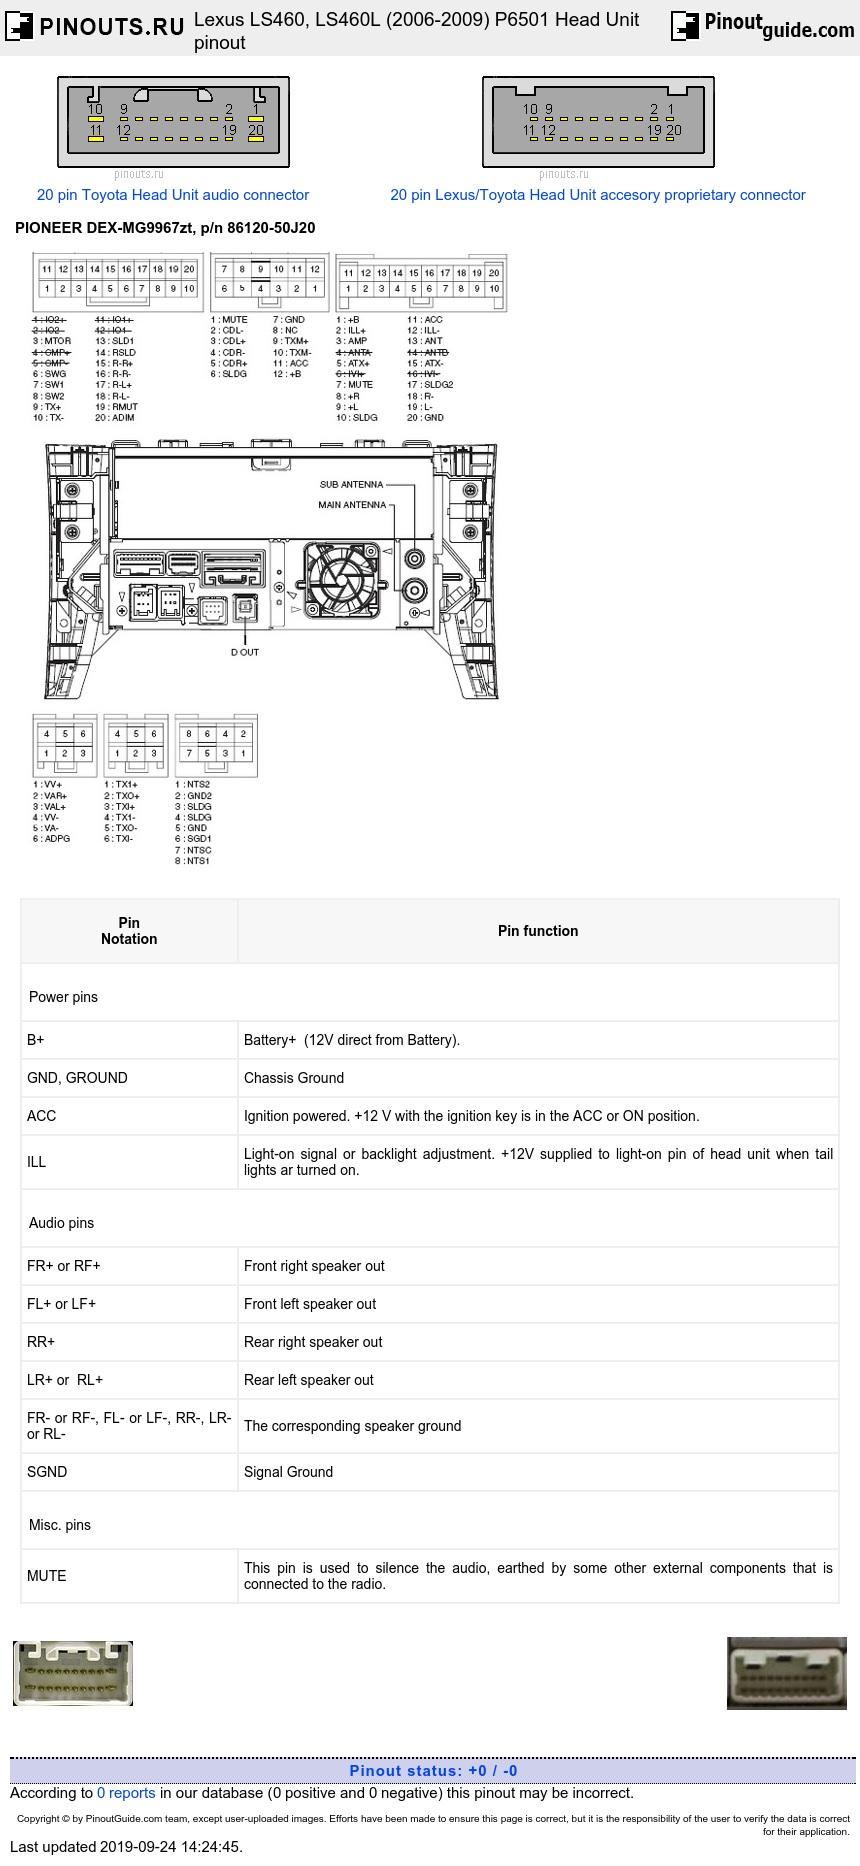 Lexus P1720 Pinout Diagram Pinoutguide Dlc Wiring P6501 Com